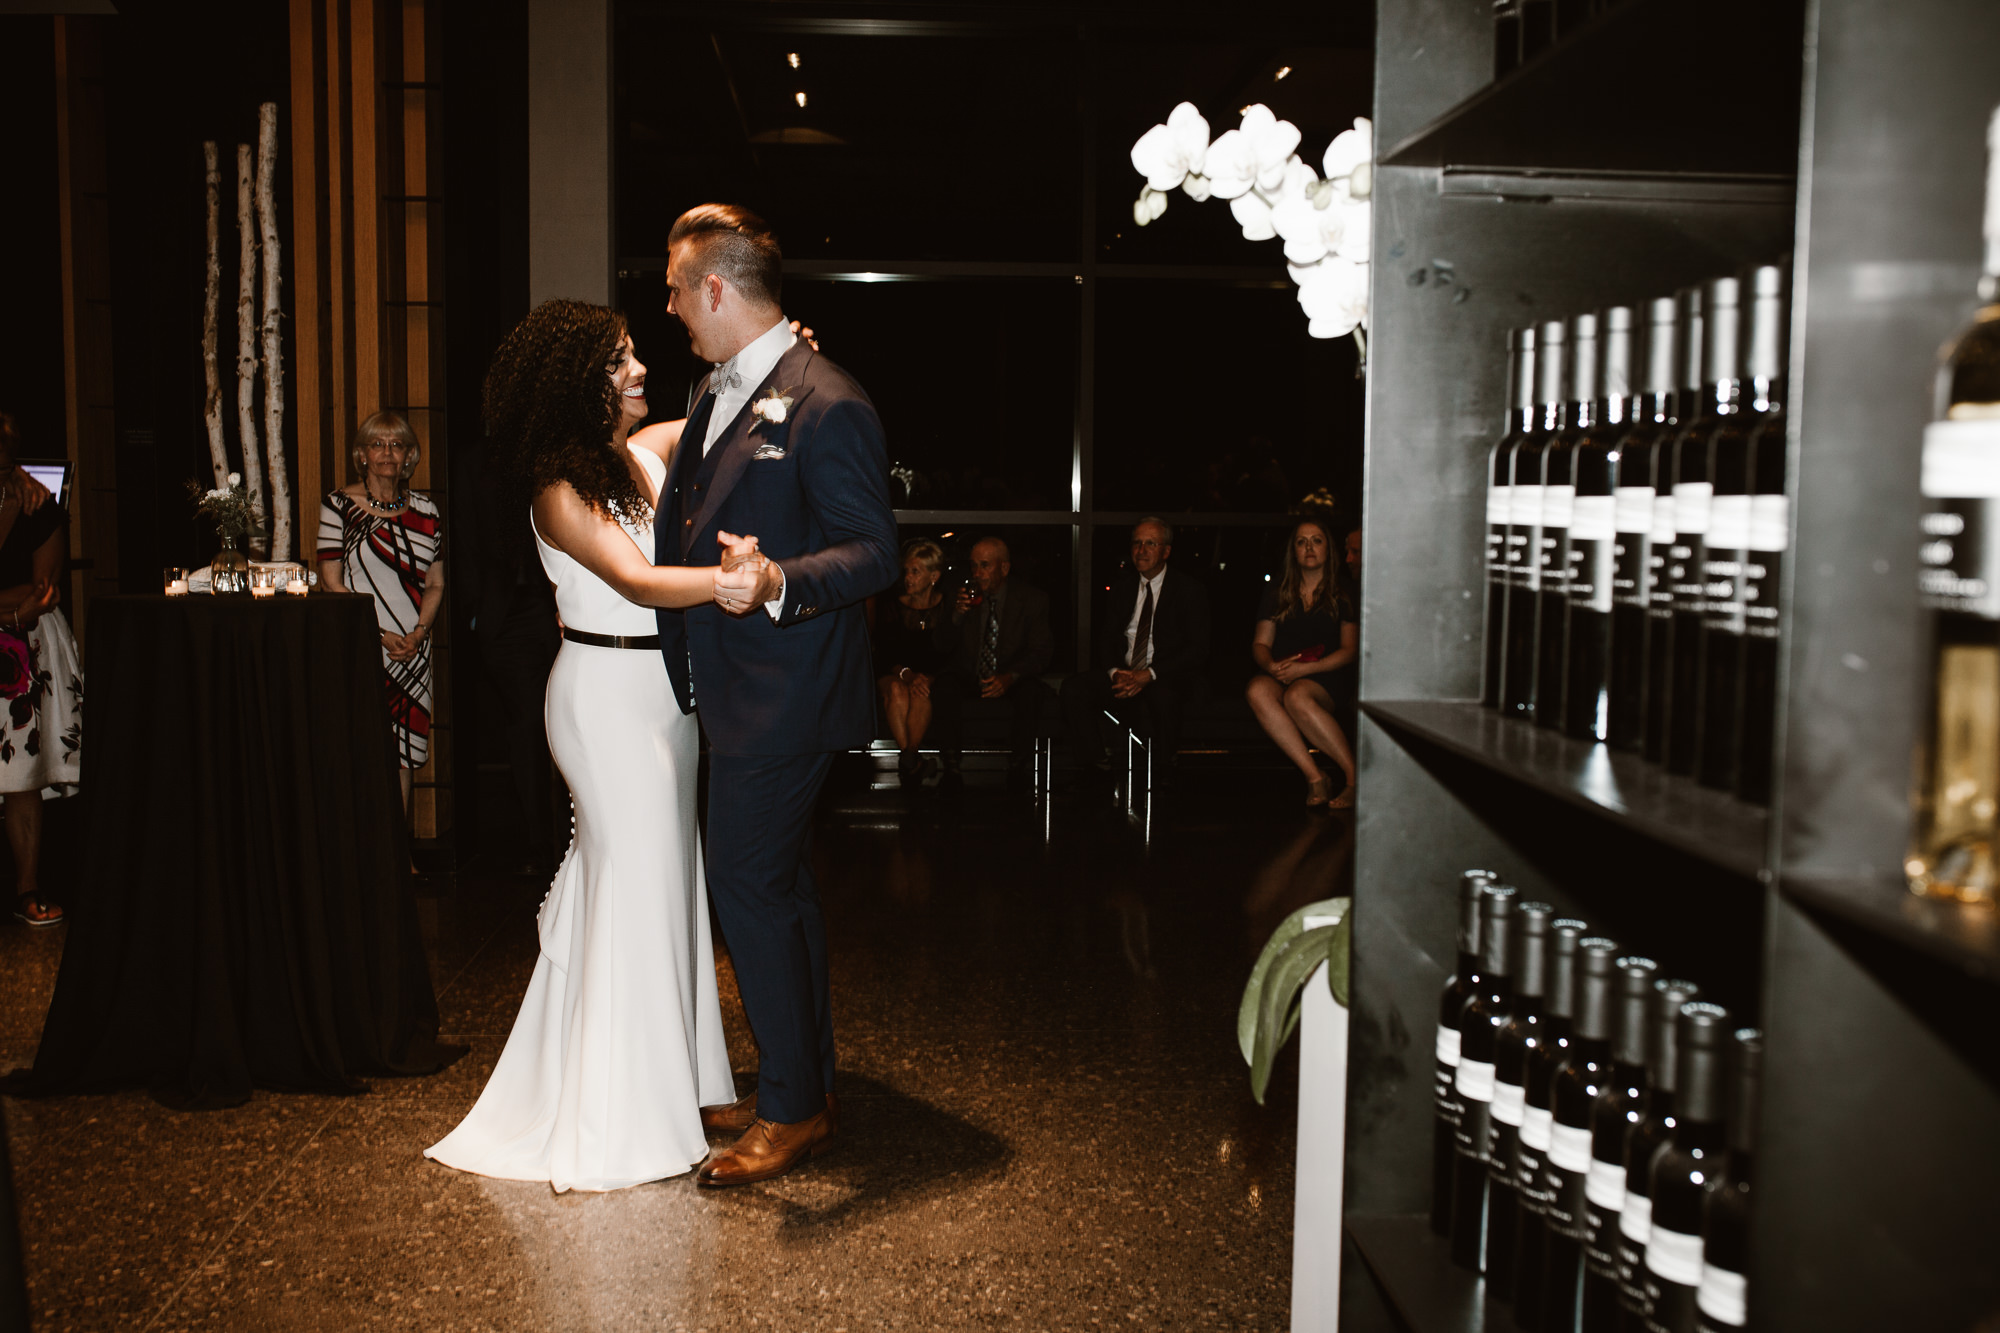 stratus-winery-wedding-vineyard-wedding-vineyard-bride-photo-by-reed-photography-053.jpg